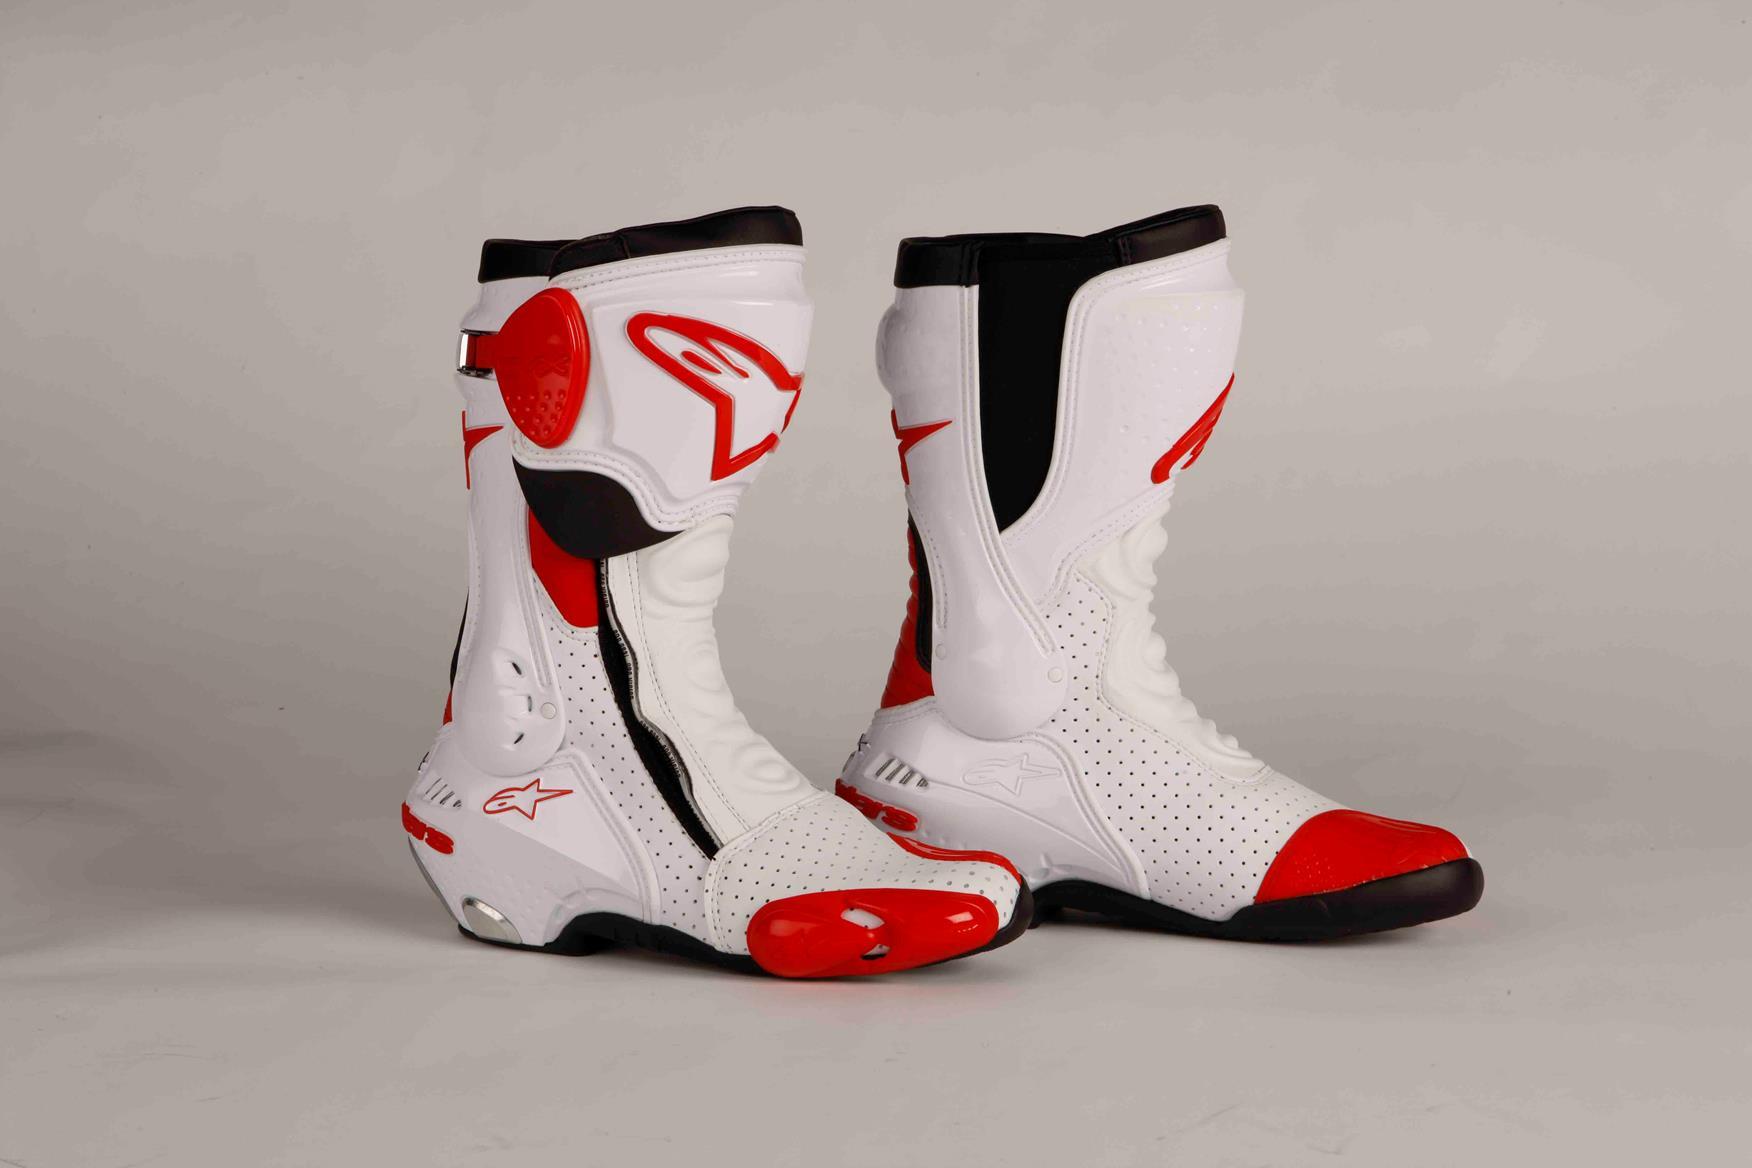 mcn biking britain survey top 10 most comfortable racing boots mcn. Black Bedroom Furniture Sets. Home Design Ideas